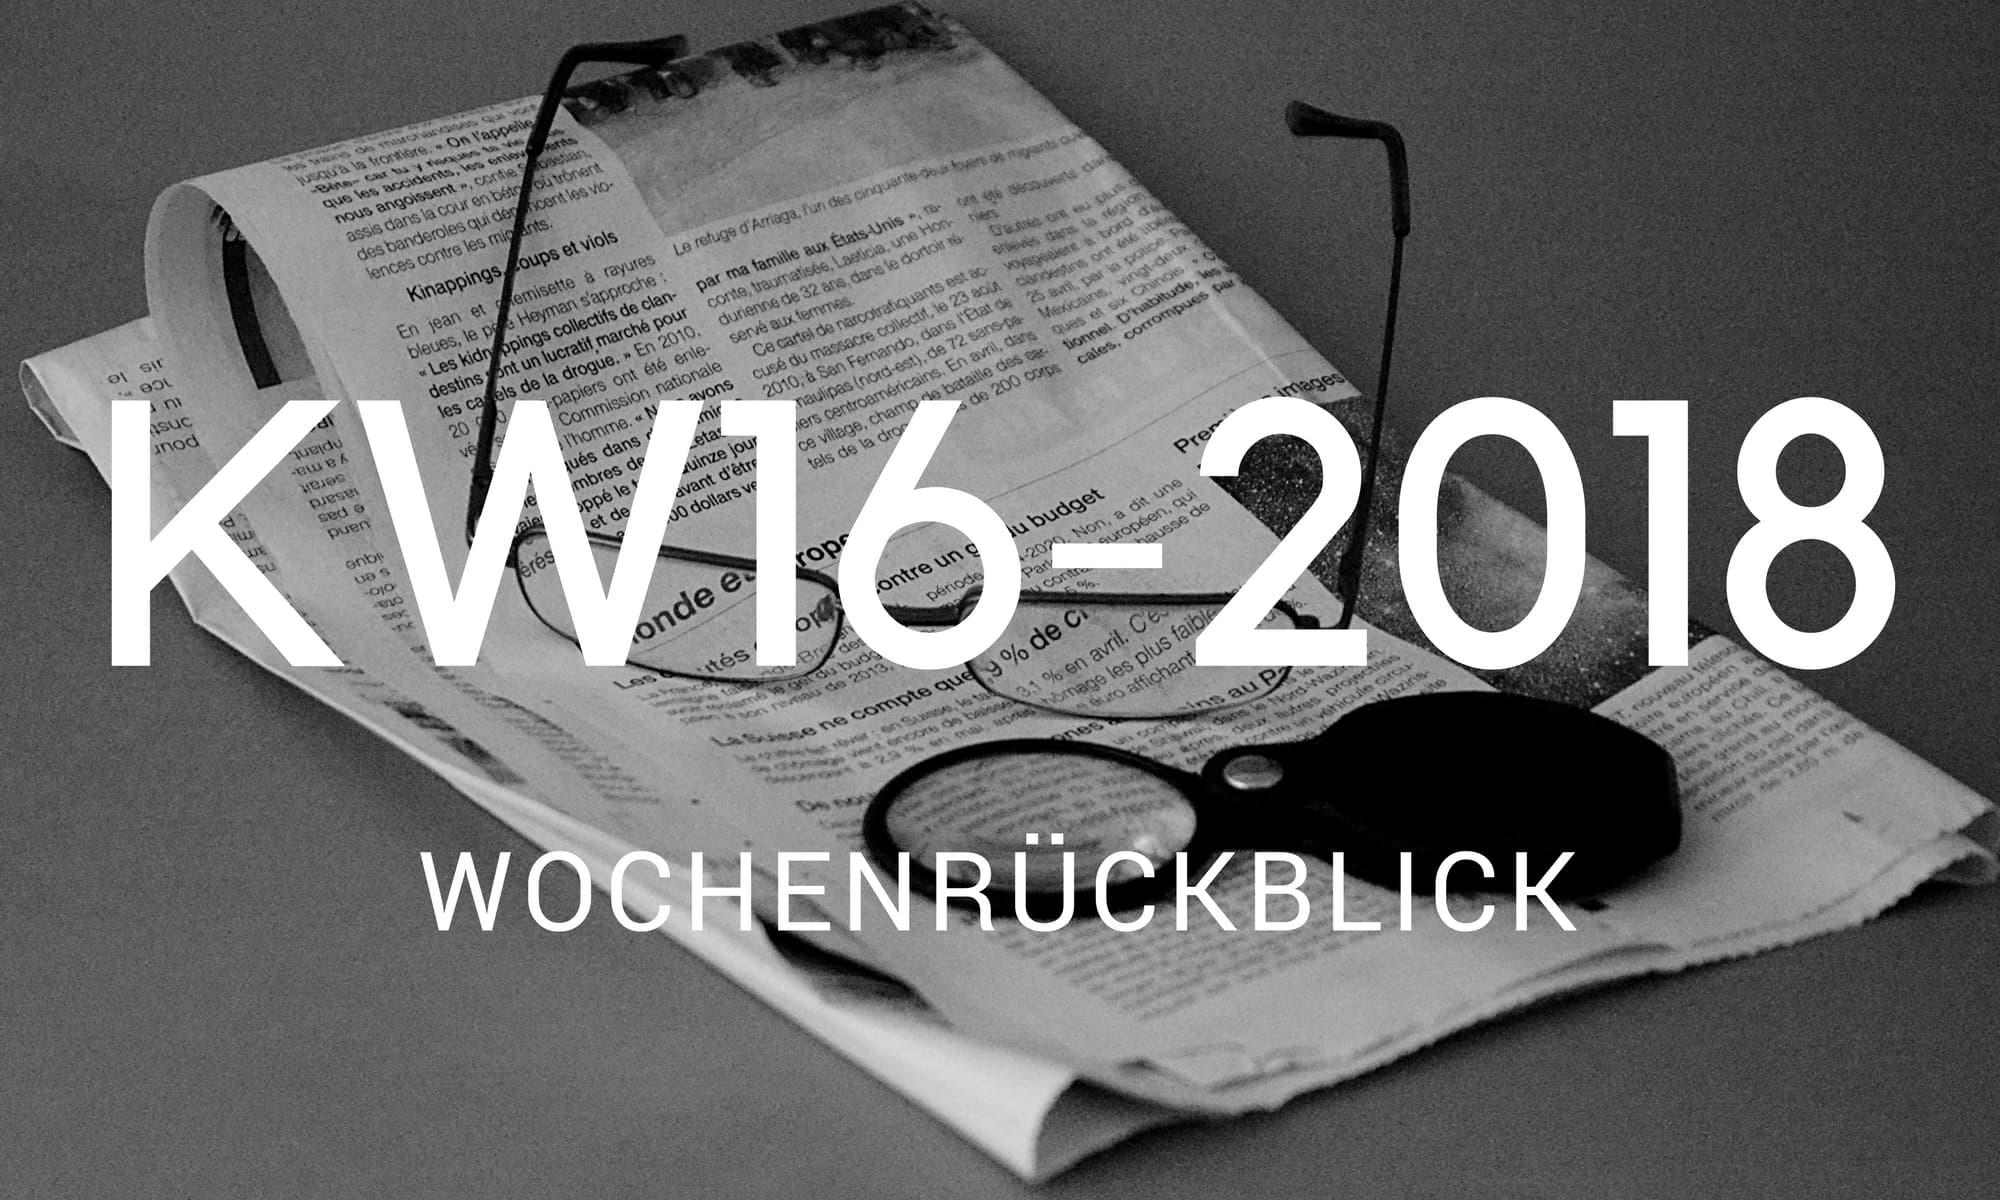 wochenrueckblick camping news KW16 2018